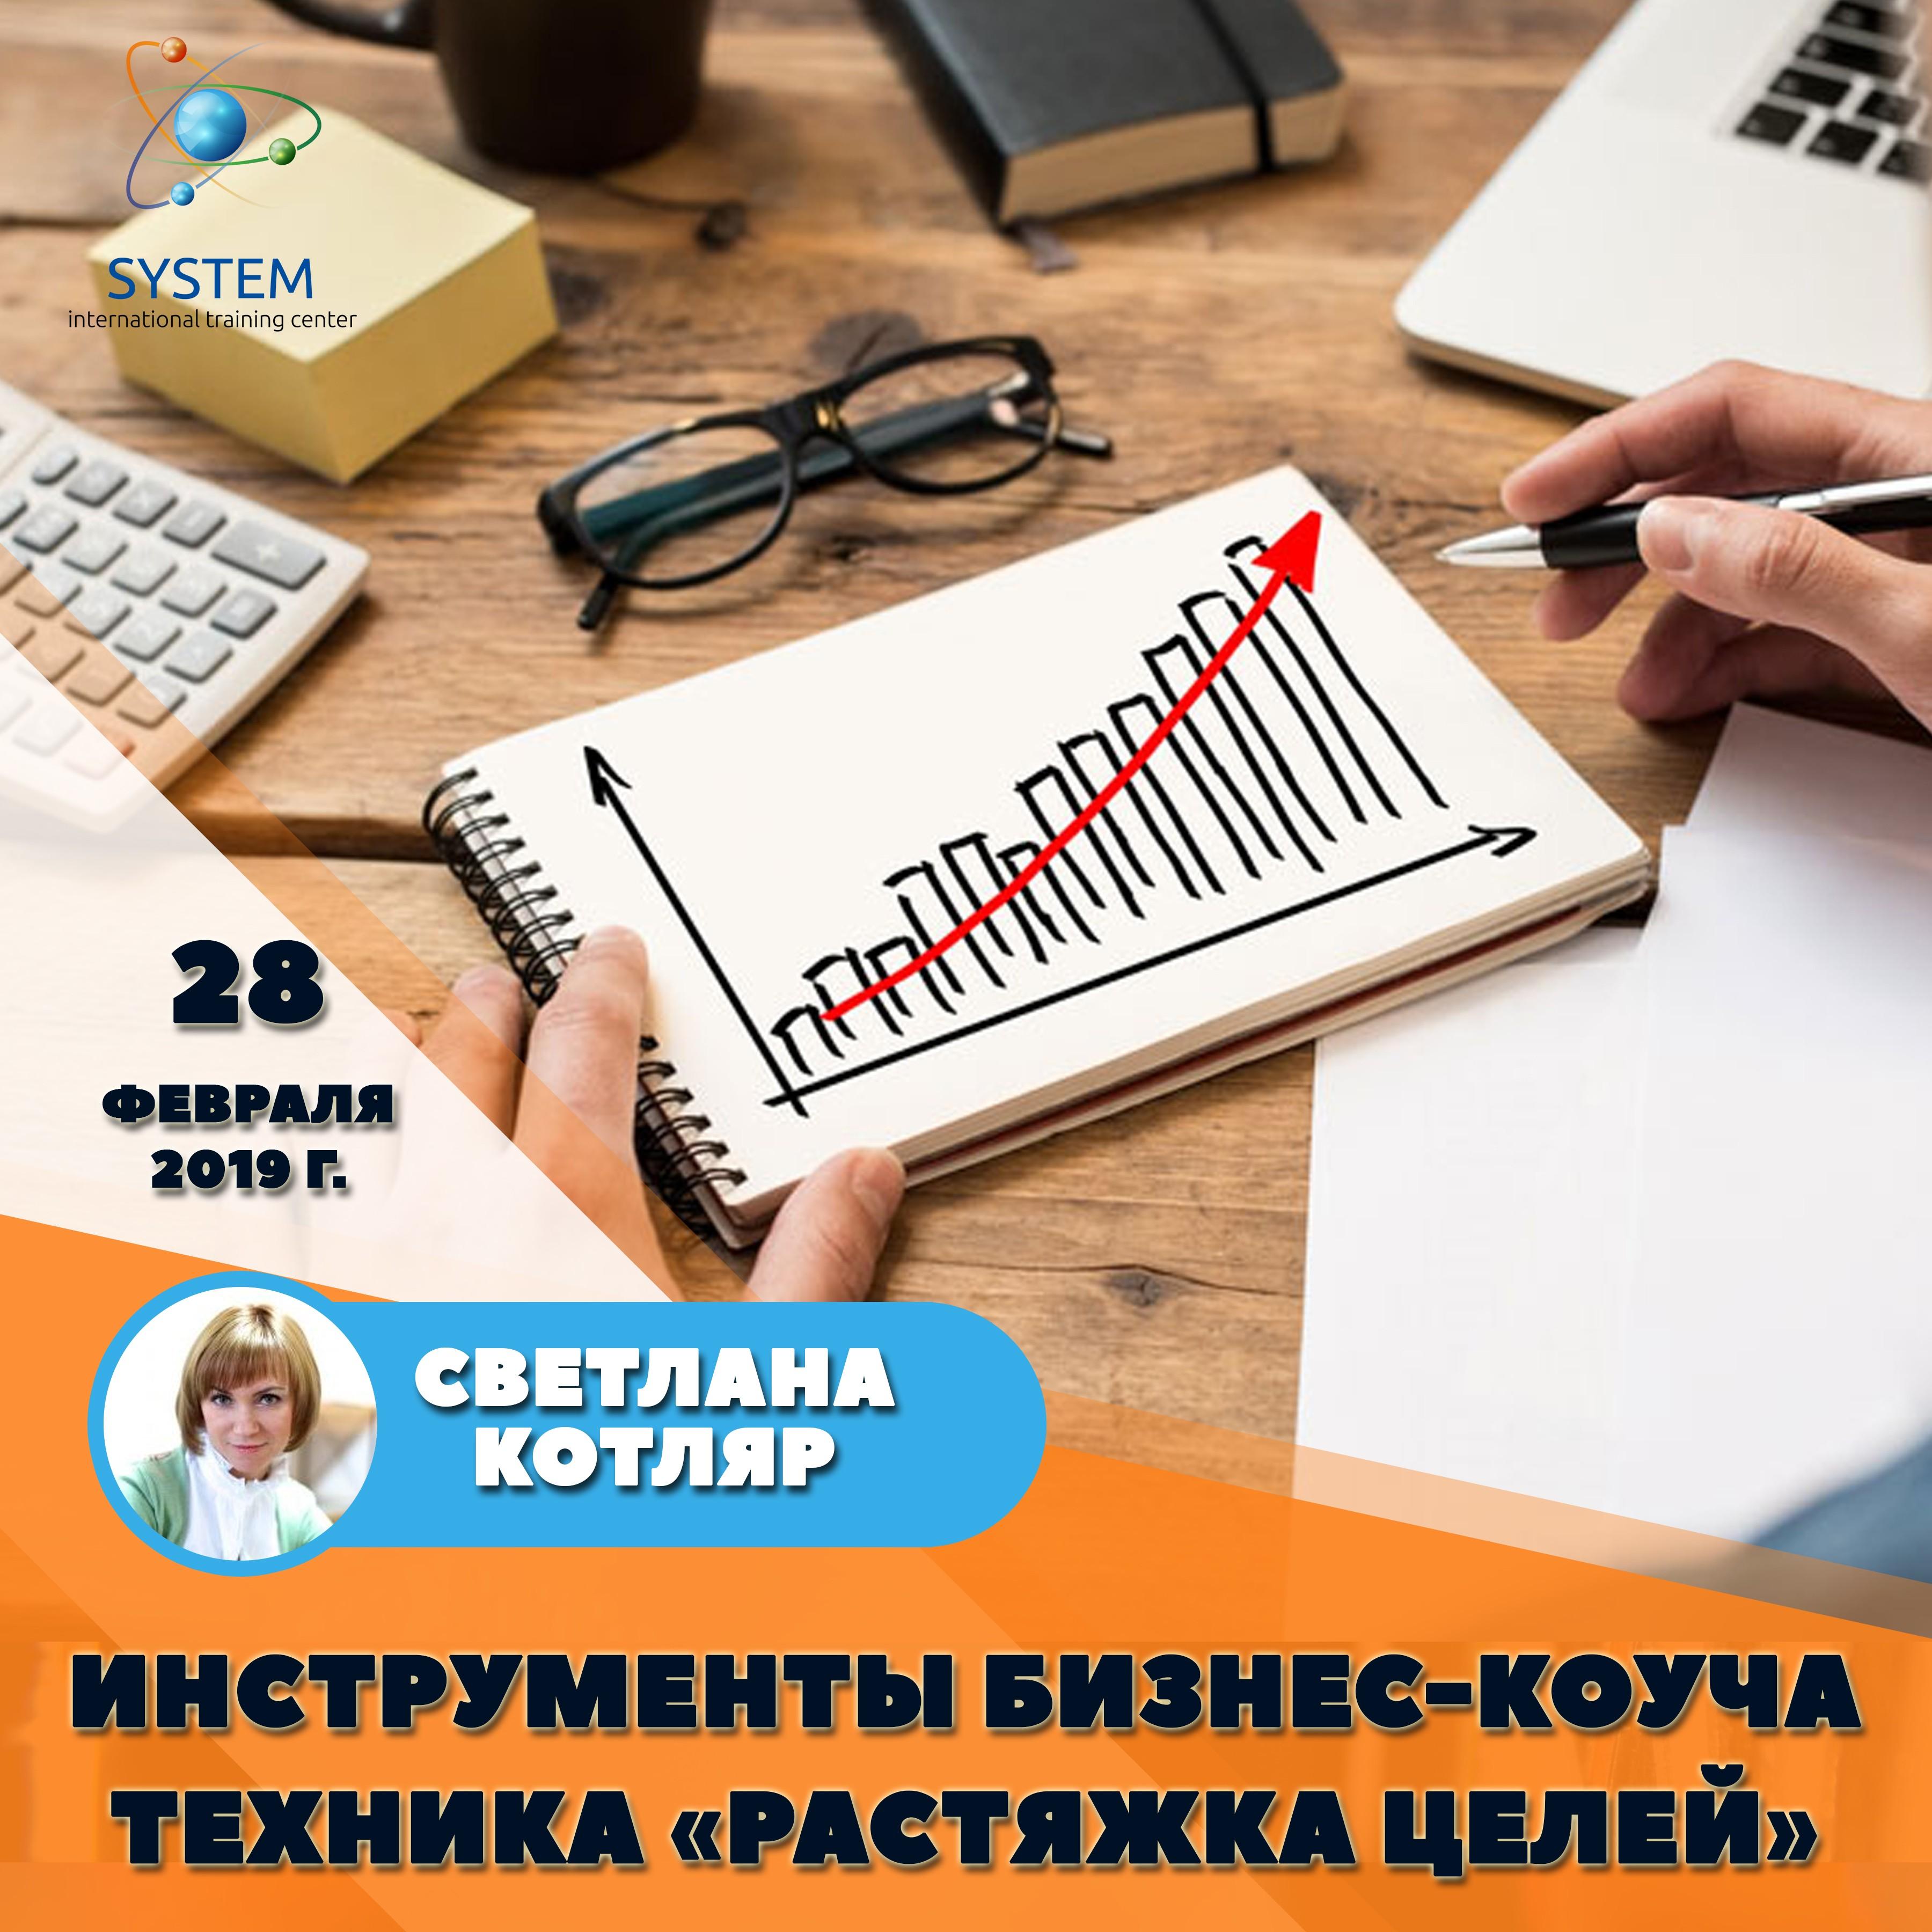 Инструменты бизнес-коуча. Техника «Растяжка целей» @ Владивосток, ул. Жигура, 26а, БЦ «Seven», ауд.2-7, «System ITC».